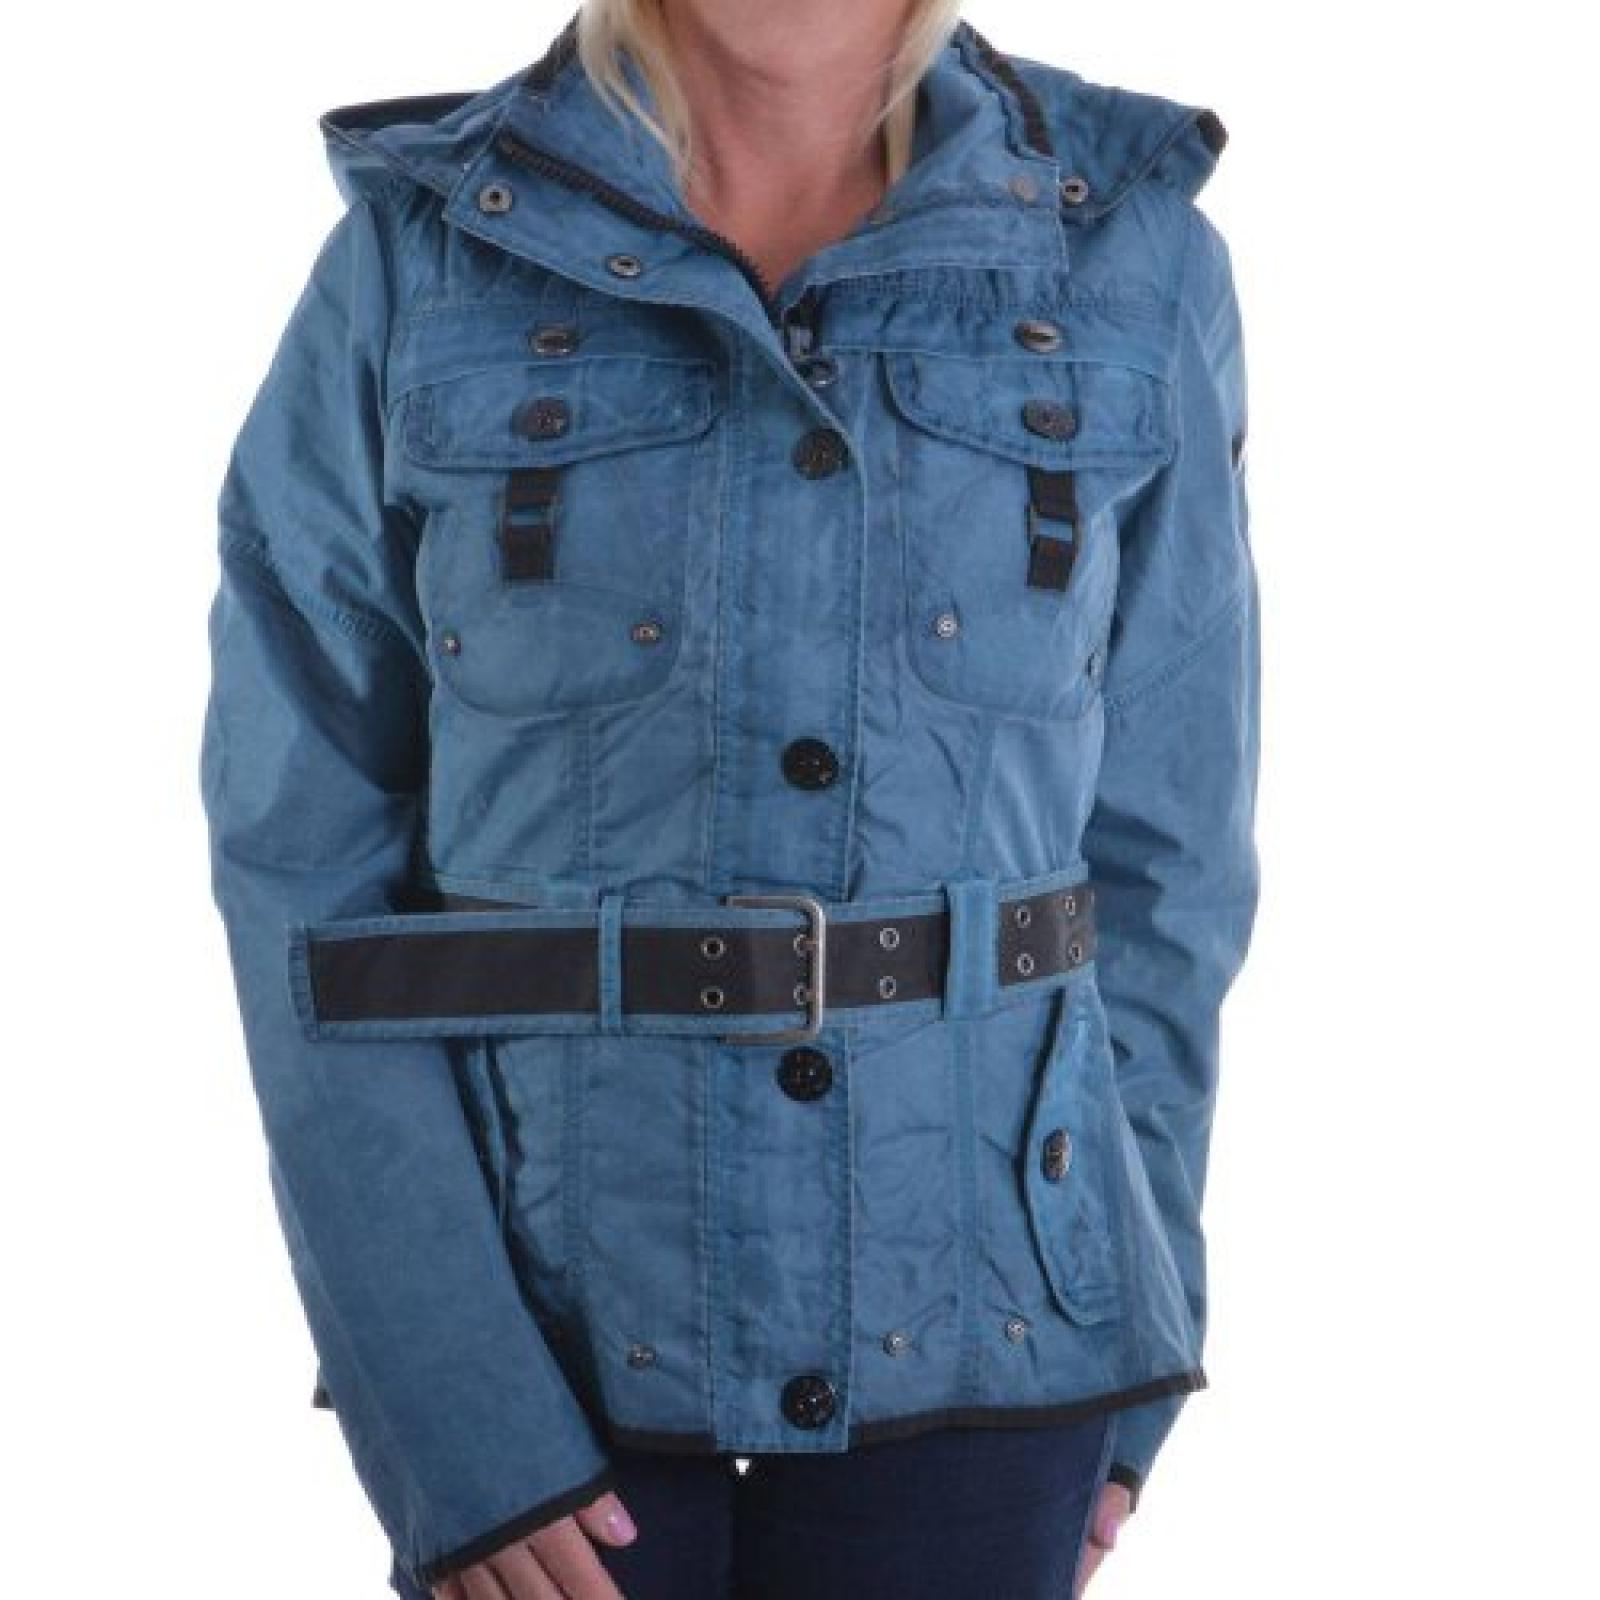 Wellensteyn Damenjacke Chocolate Gr. L UVP 299,00 Euro COC-472 Eisblau Damen Jacke